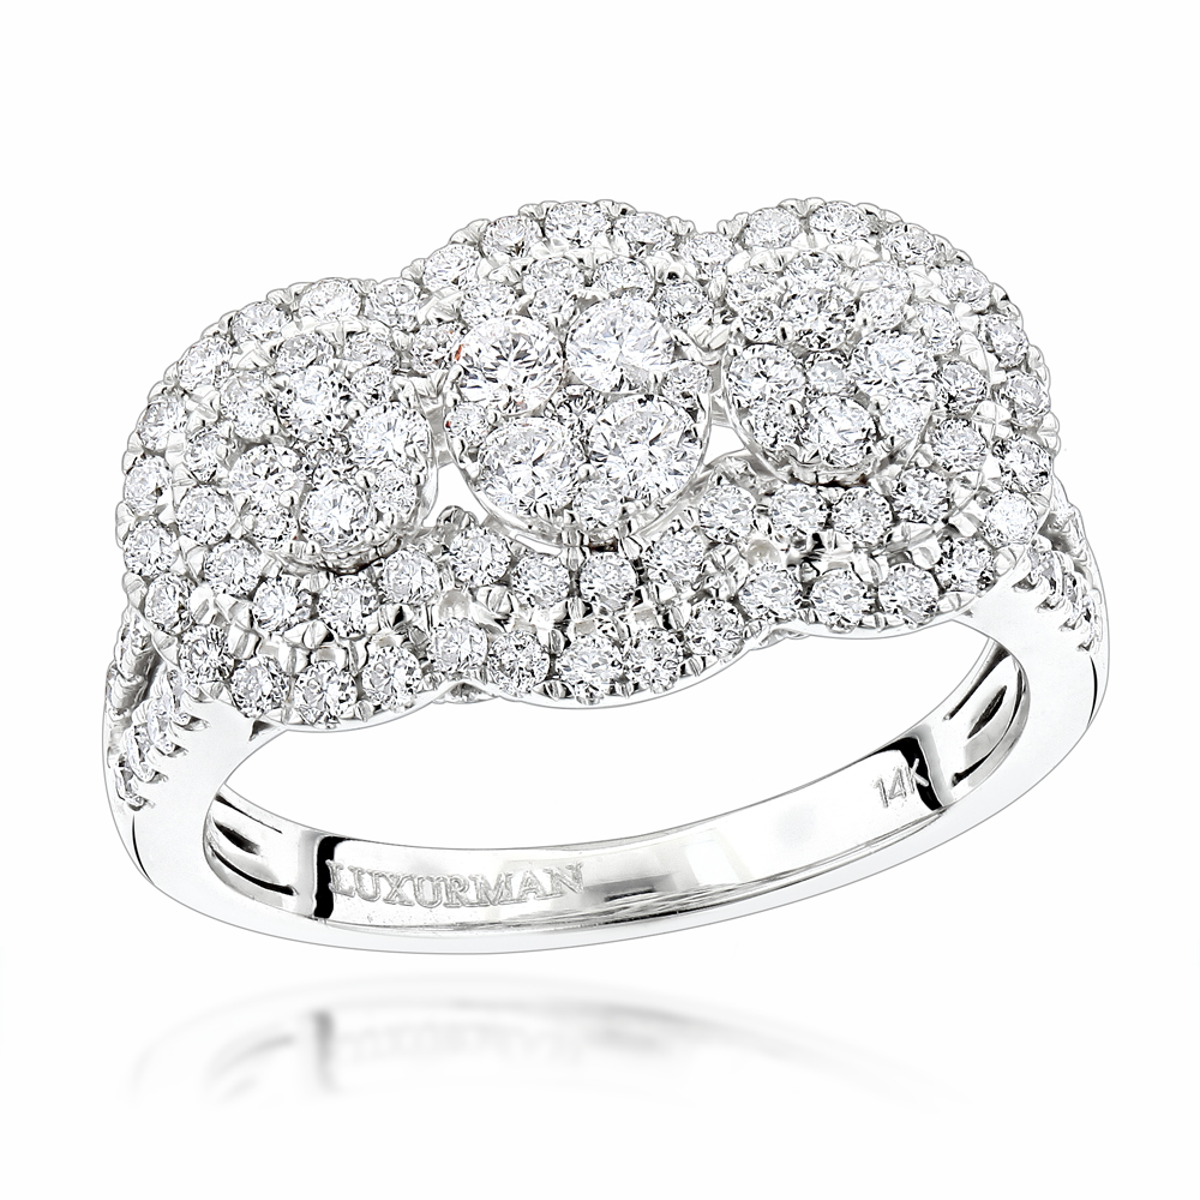 Unique Luxurman Double Halo Cluster Diamond Engagement Ring 1.6ct 14K Gold